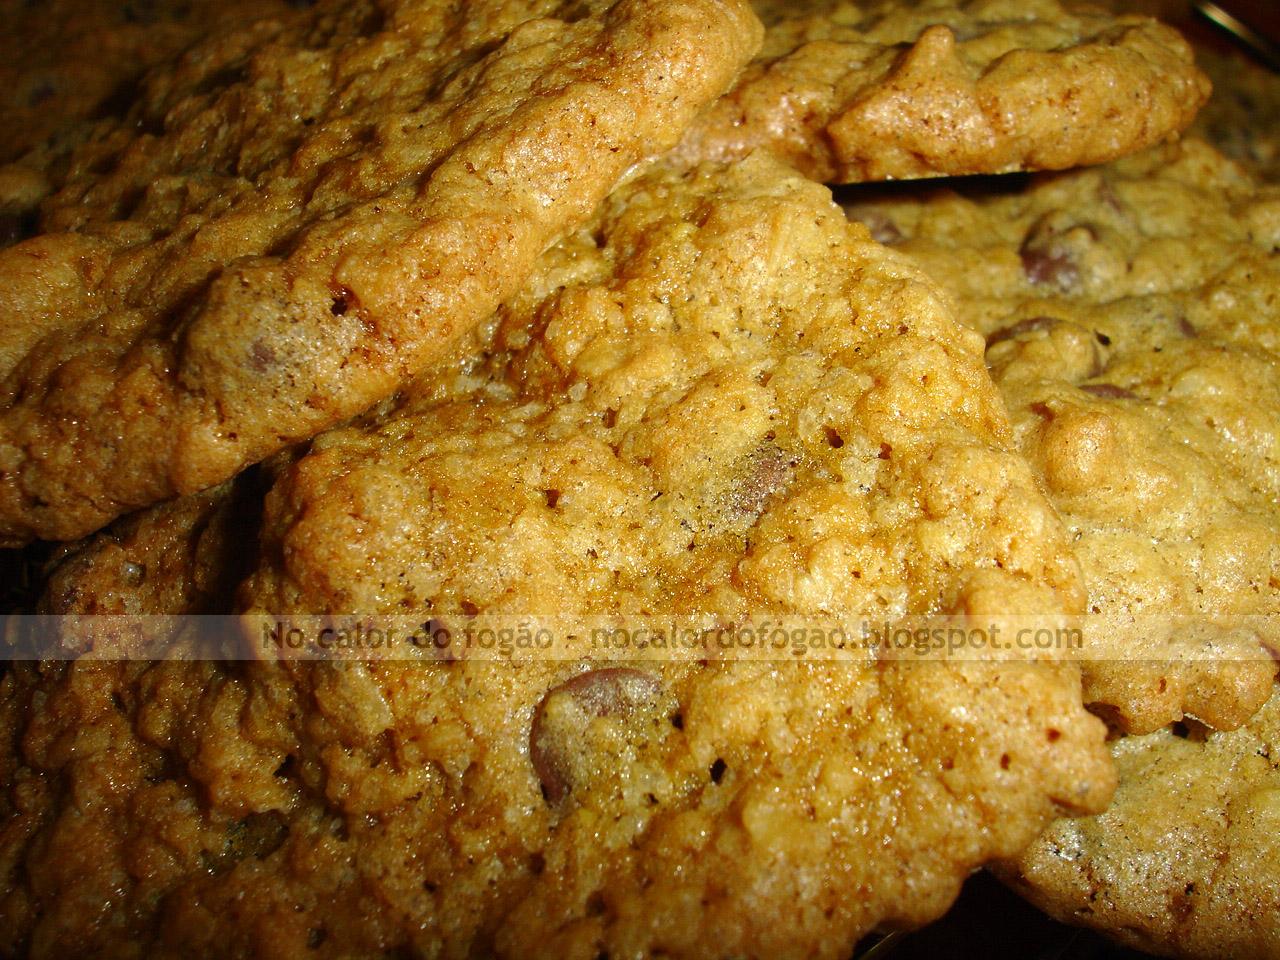 Cookies de aveia, chocolate e macadâmia